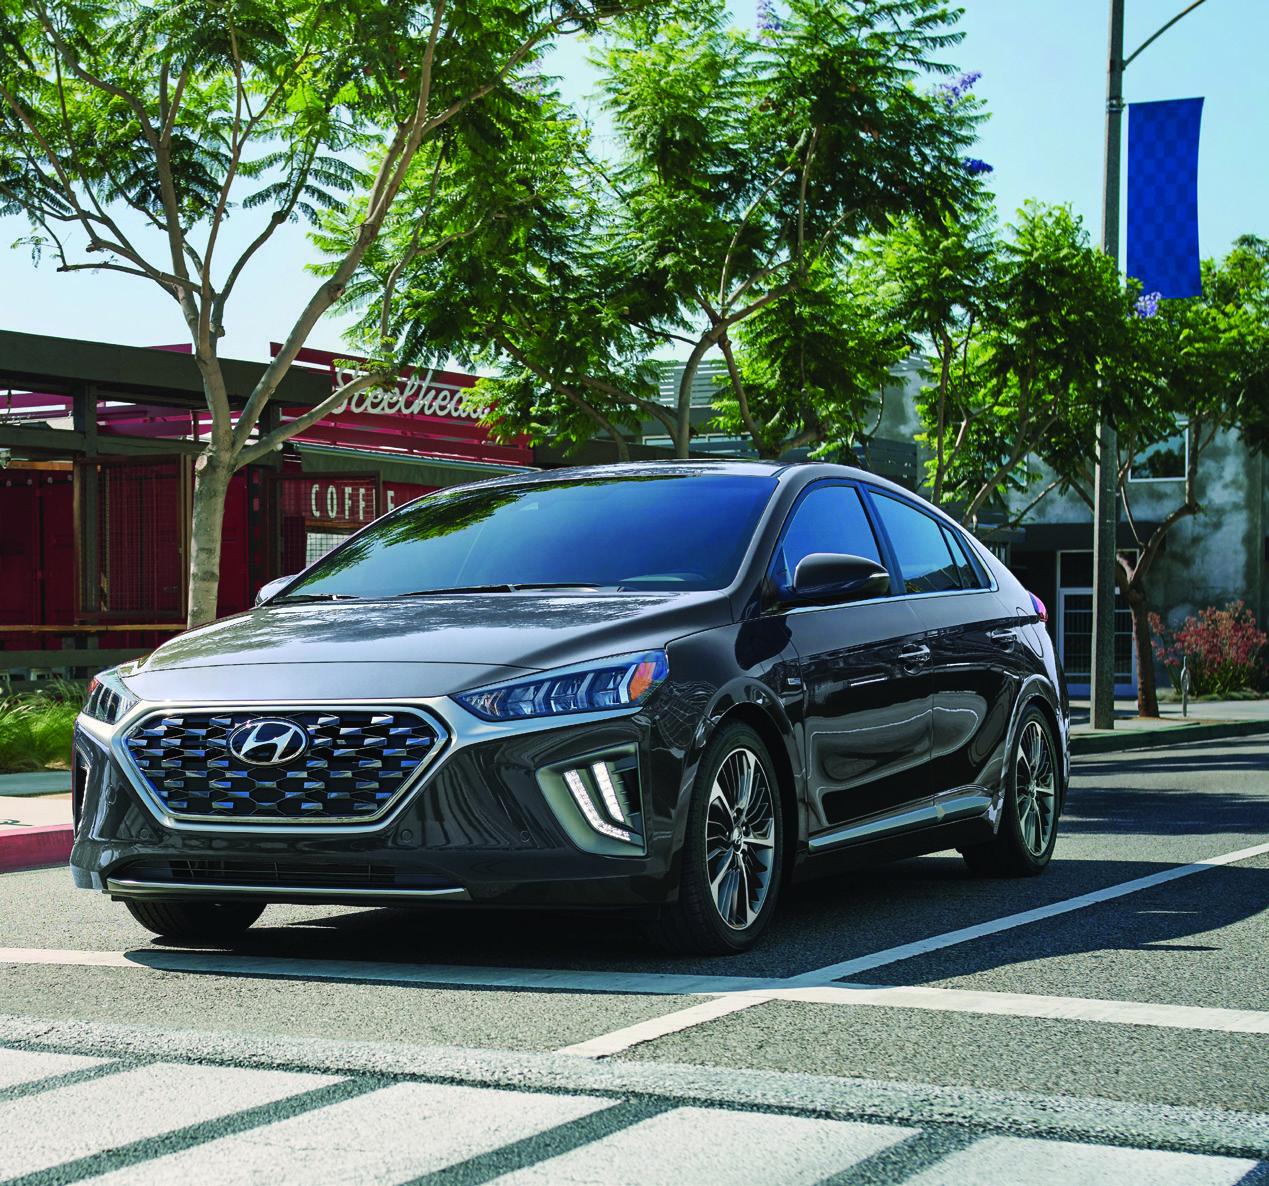 Hyundai Nexo runs on hydrogen